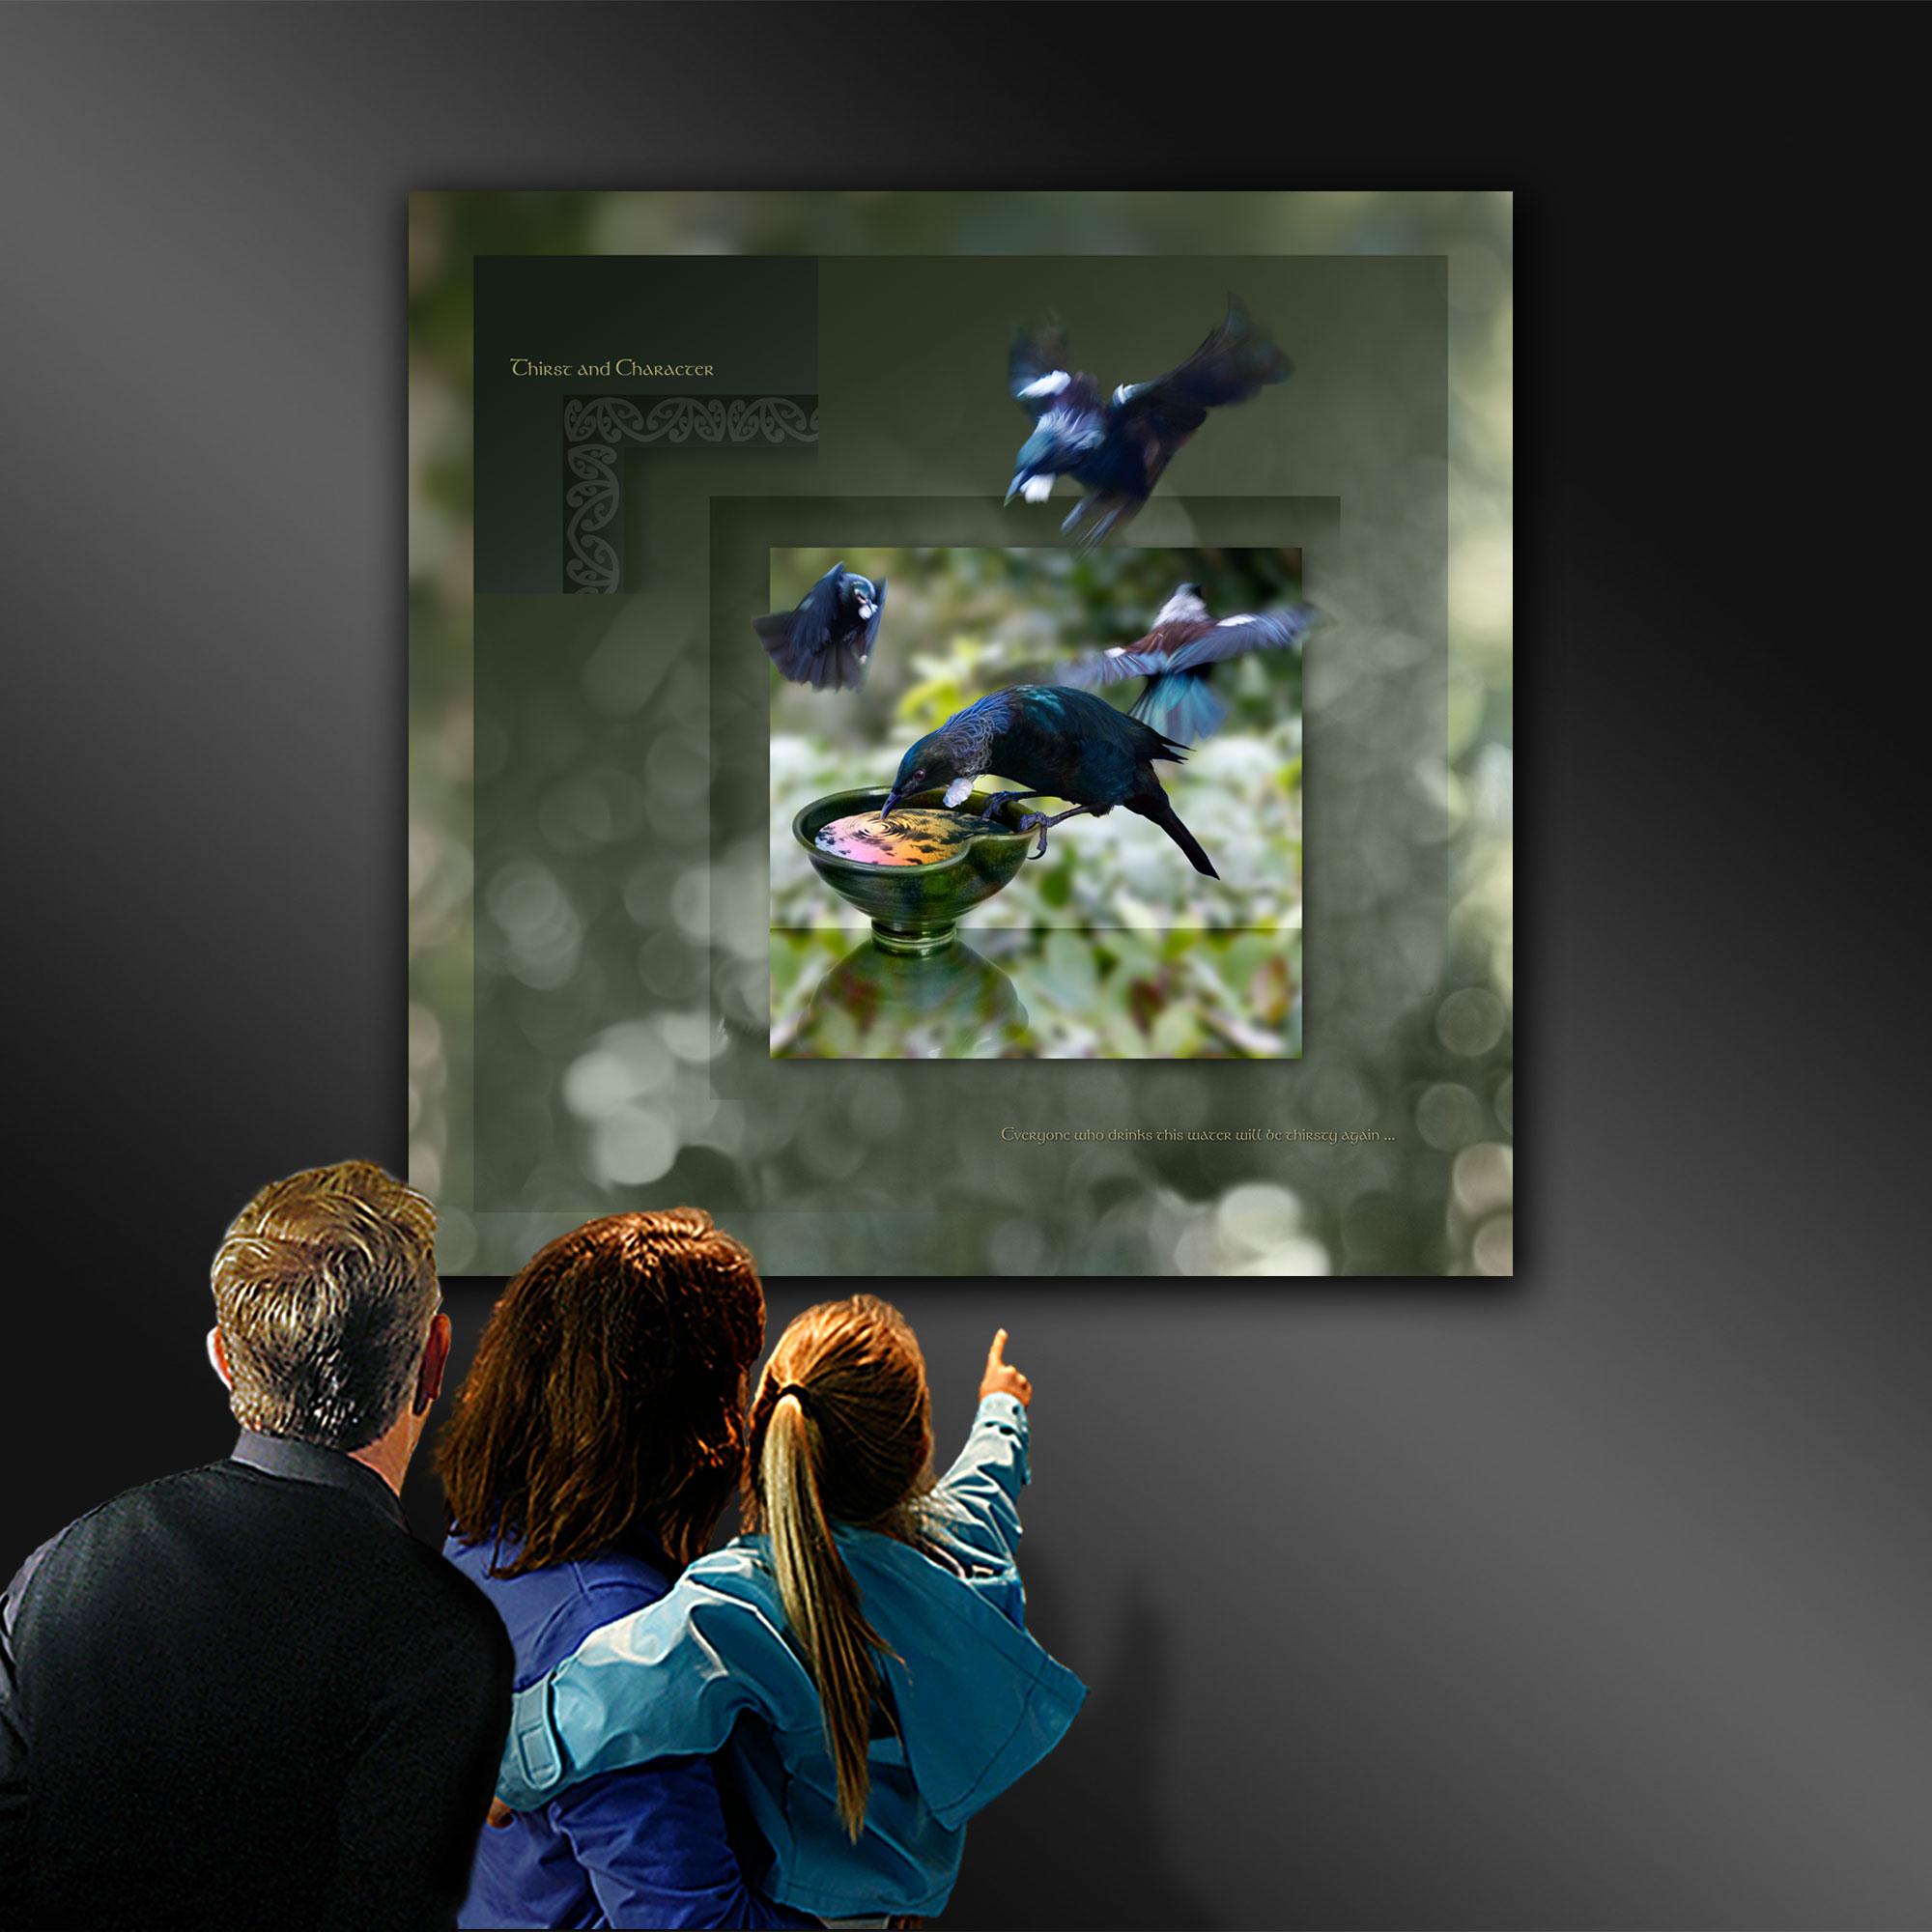 Digital photo artwork of the Tui bird, being viewed in an art gallery.